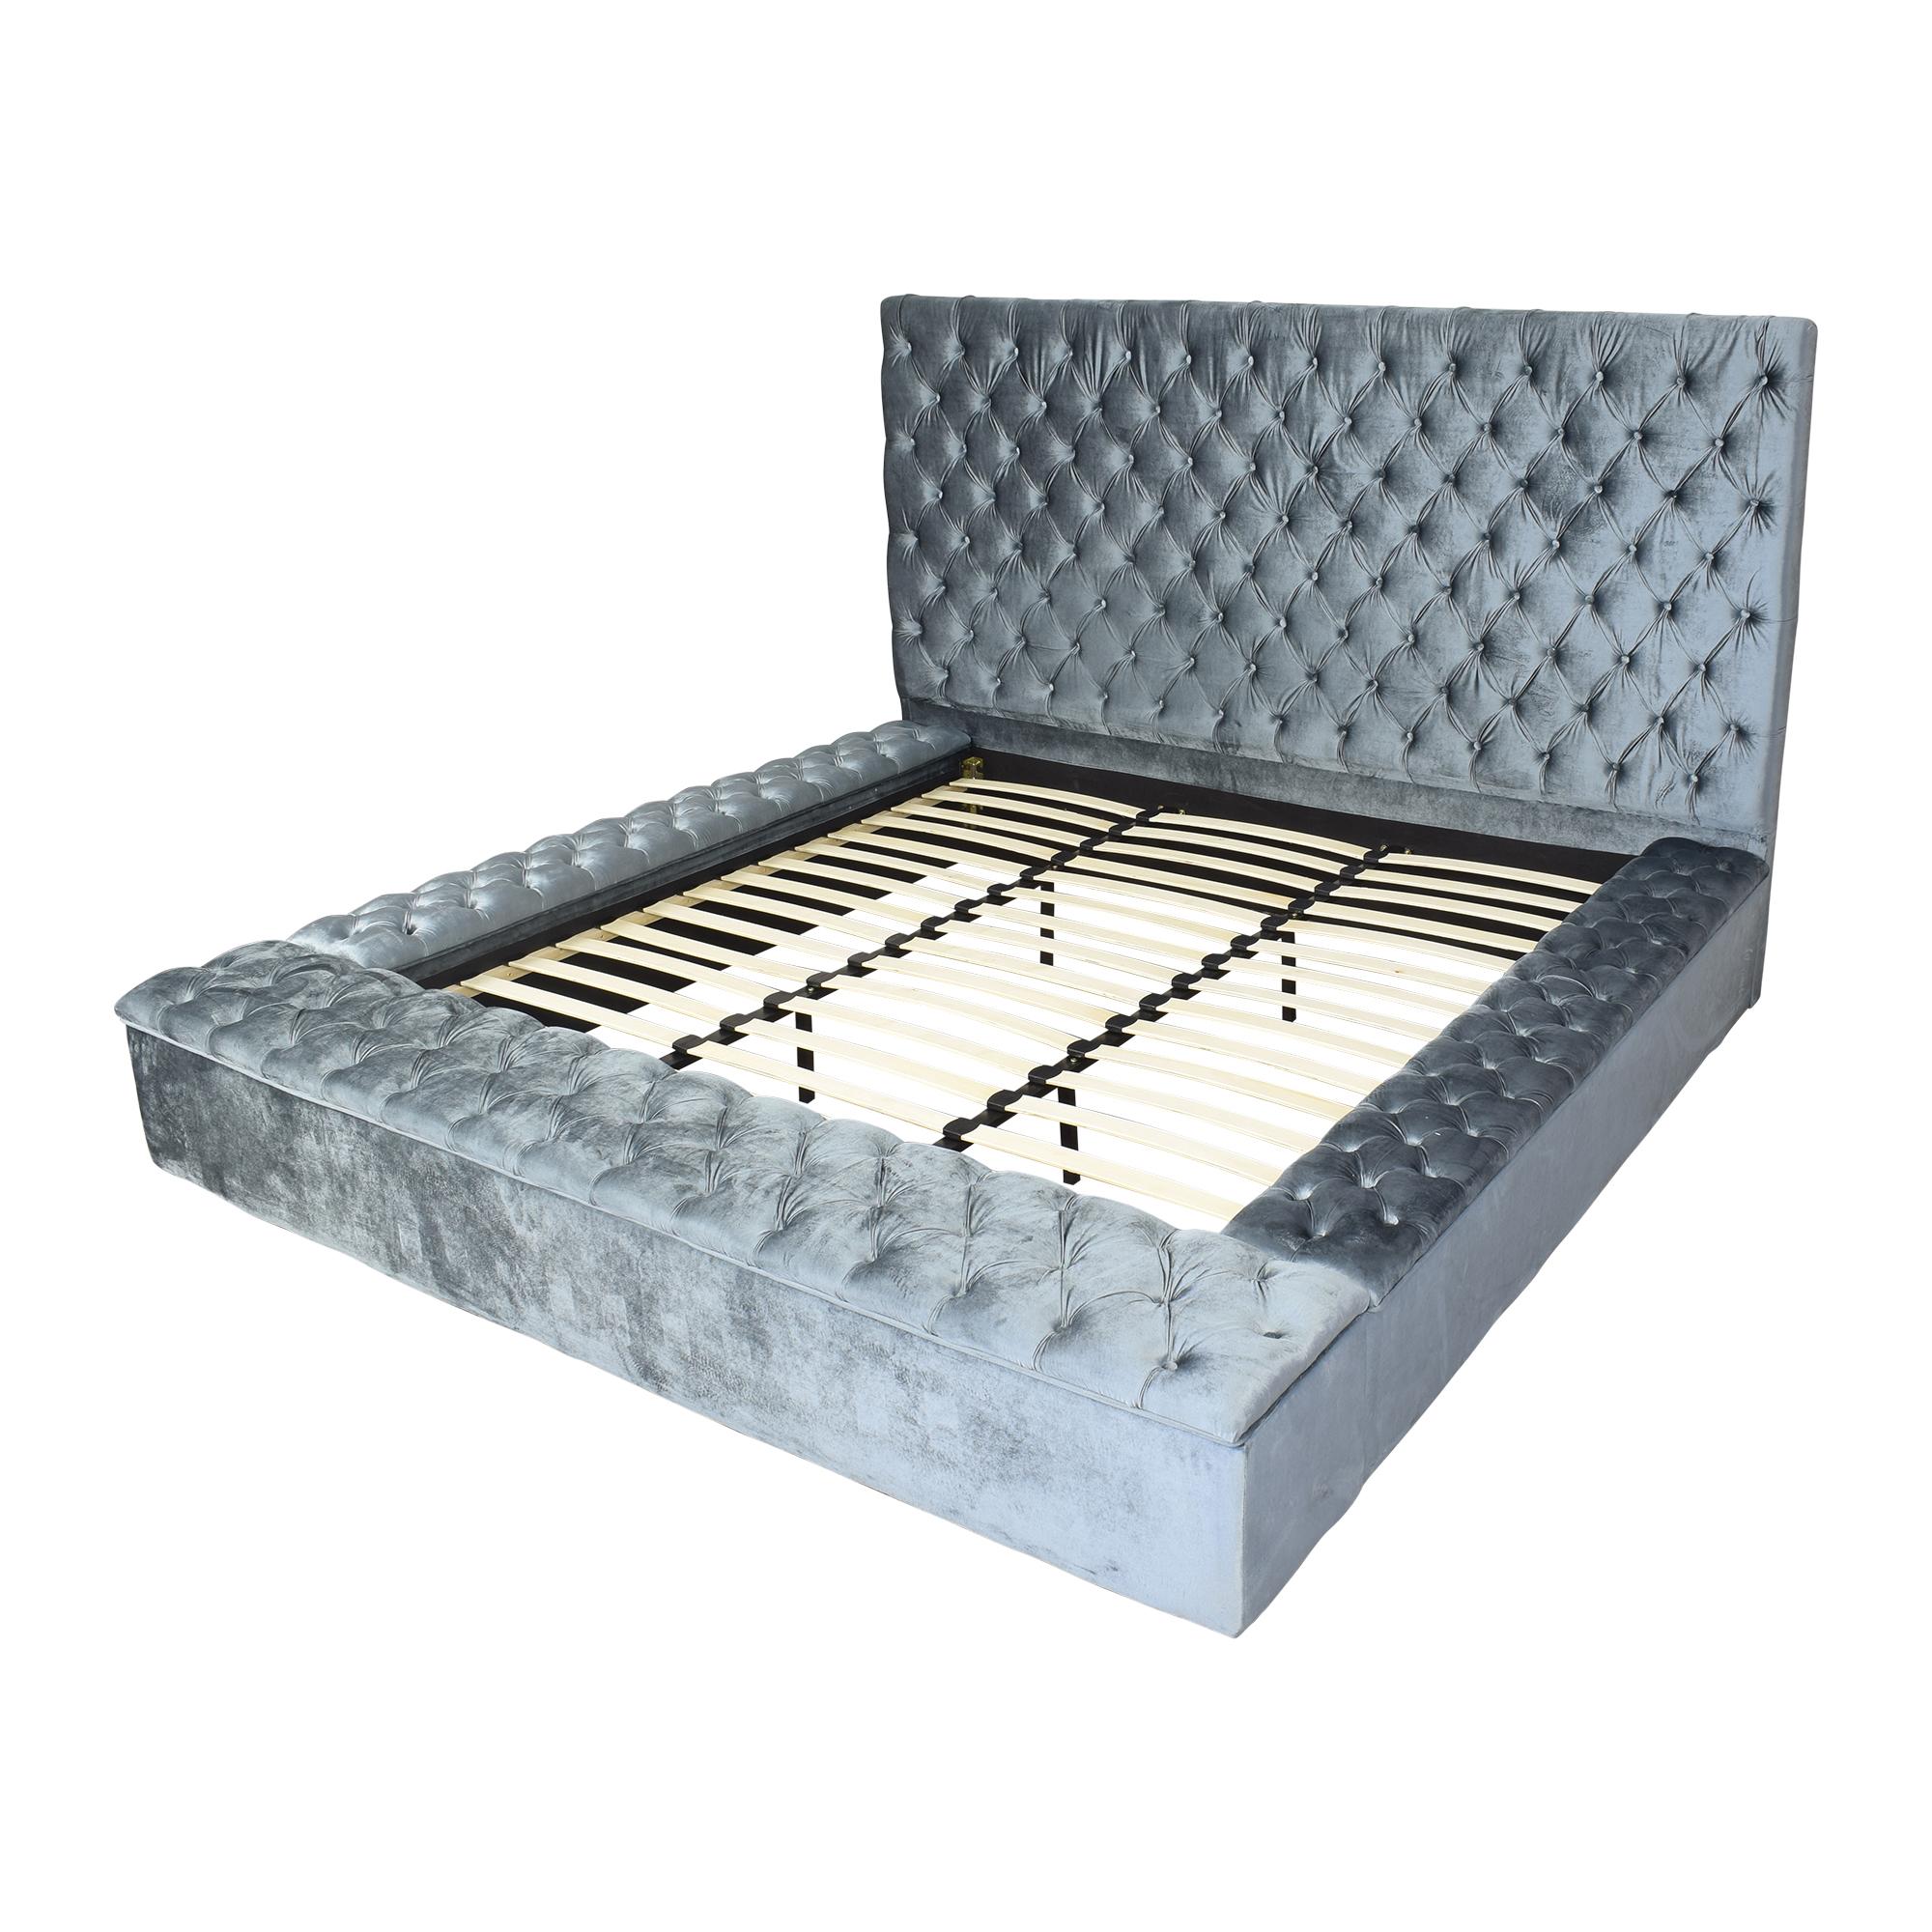 Meridian Furniture Meridian Bliss King Storage Bed used